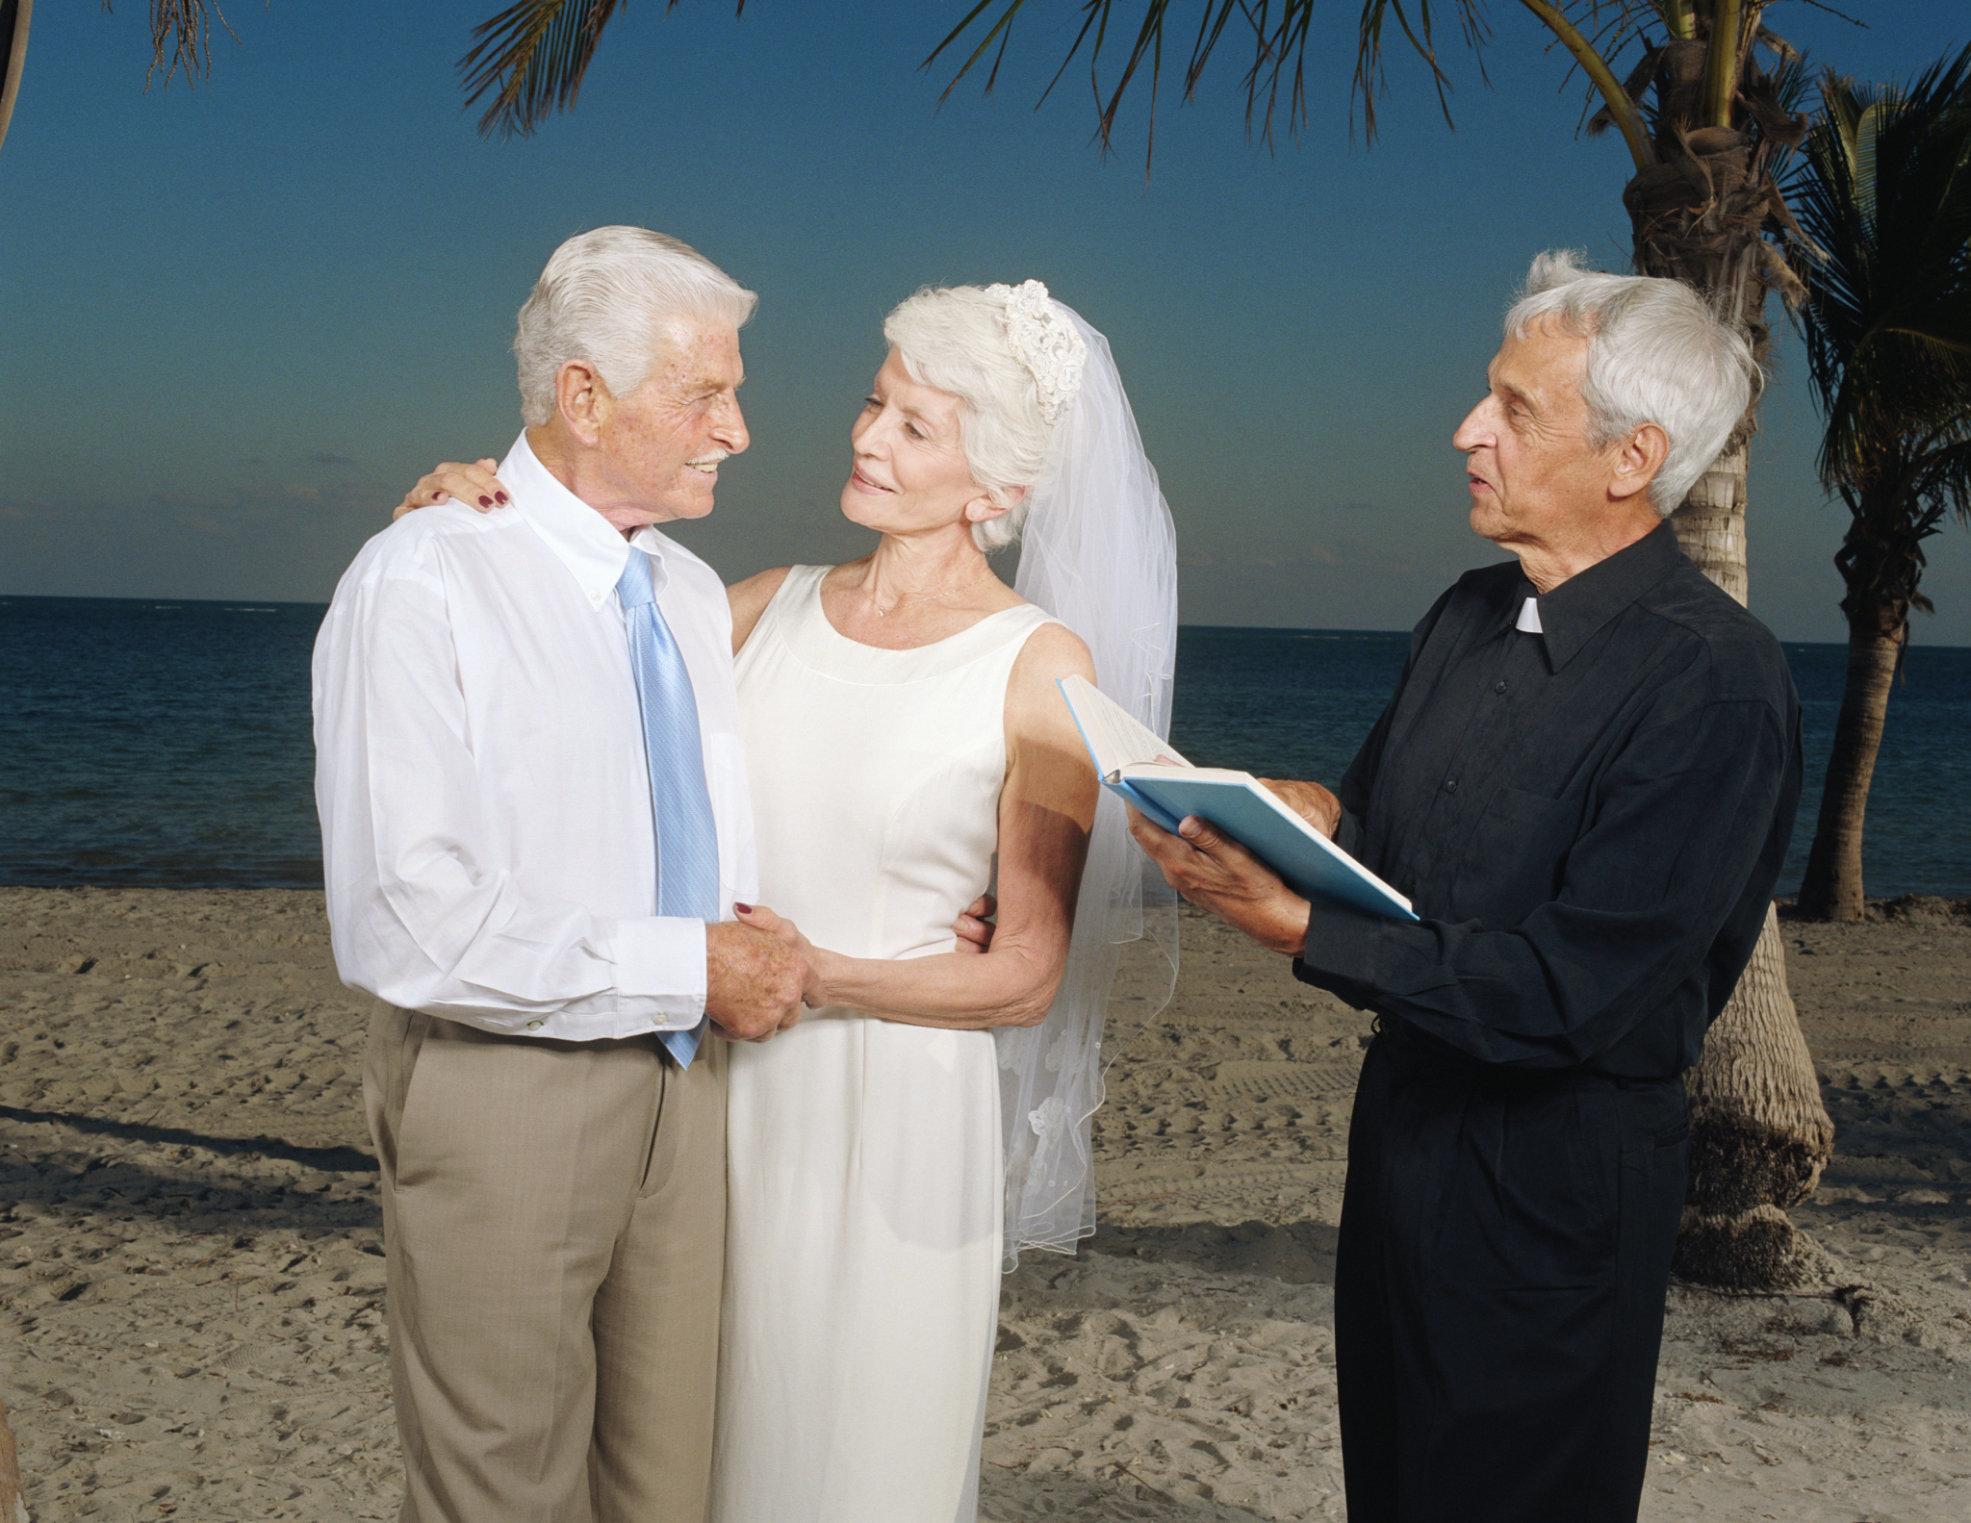 Couple Mature Wedding - Adult Archive-8280